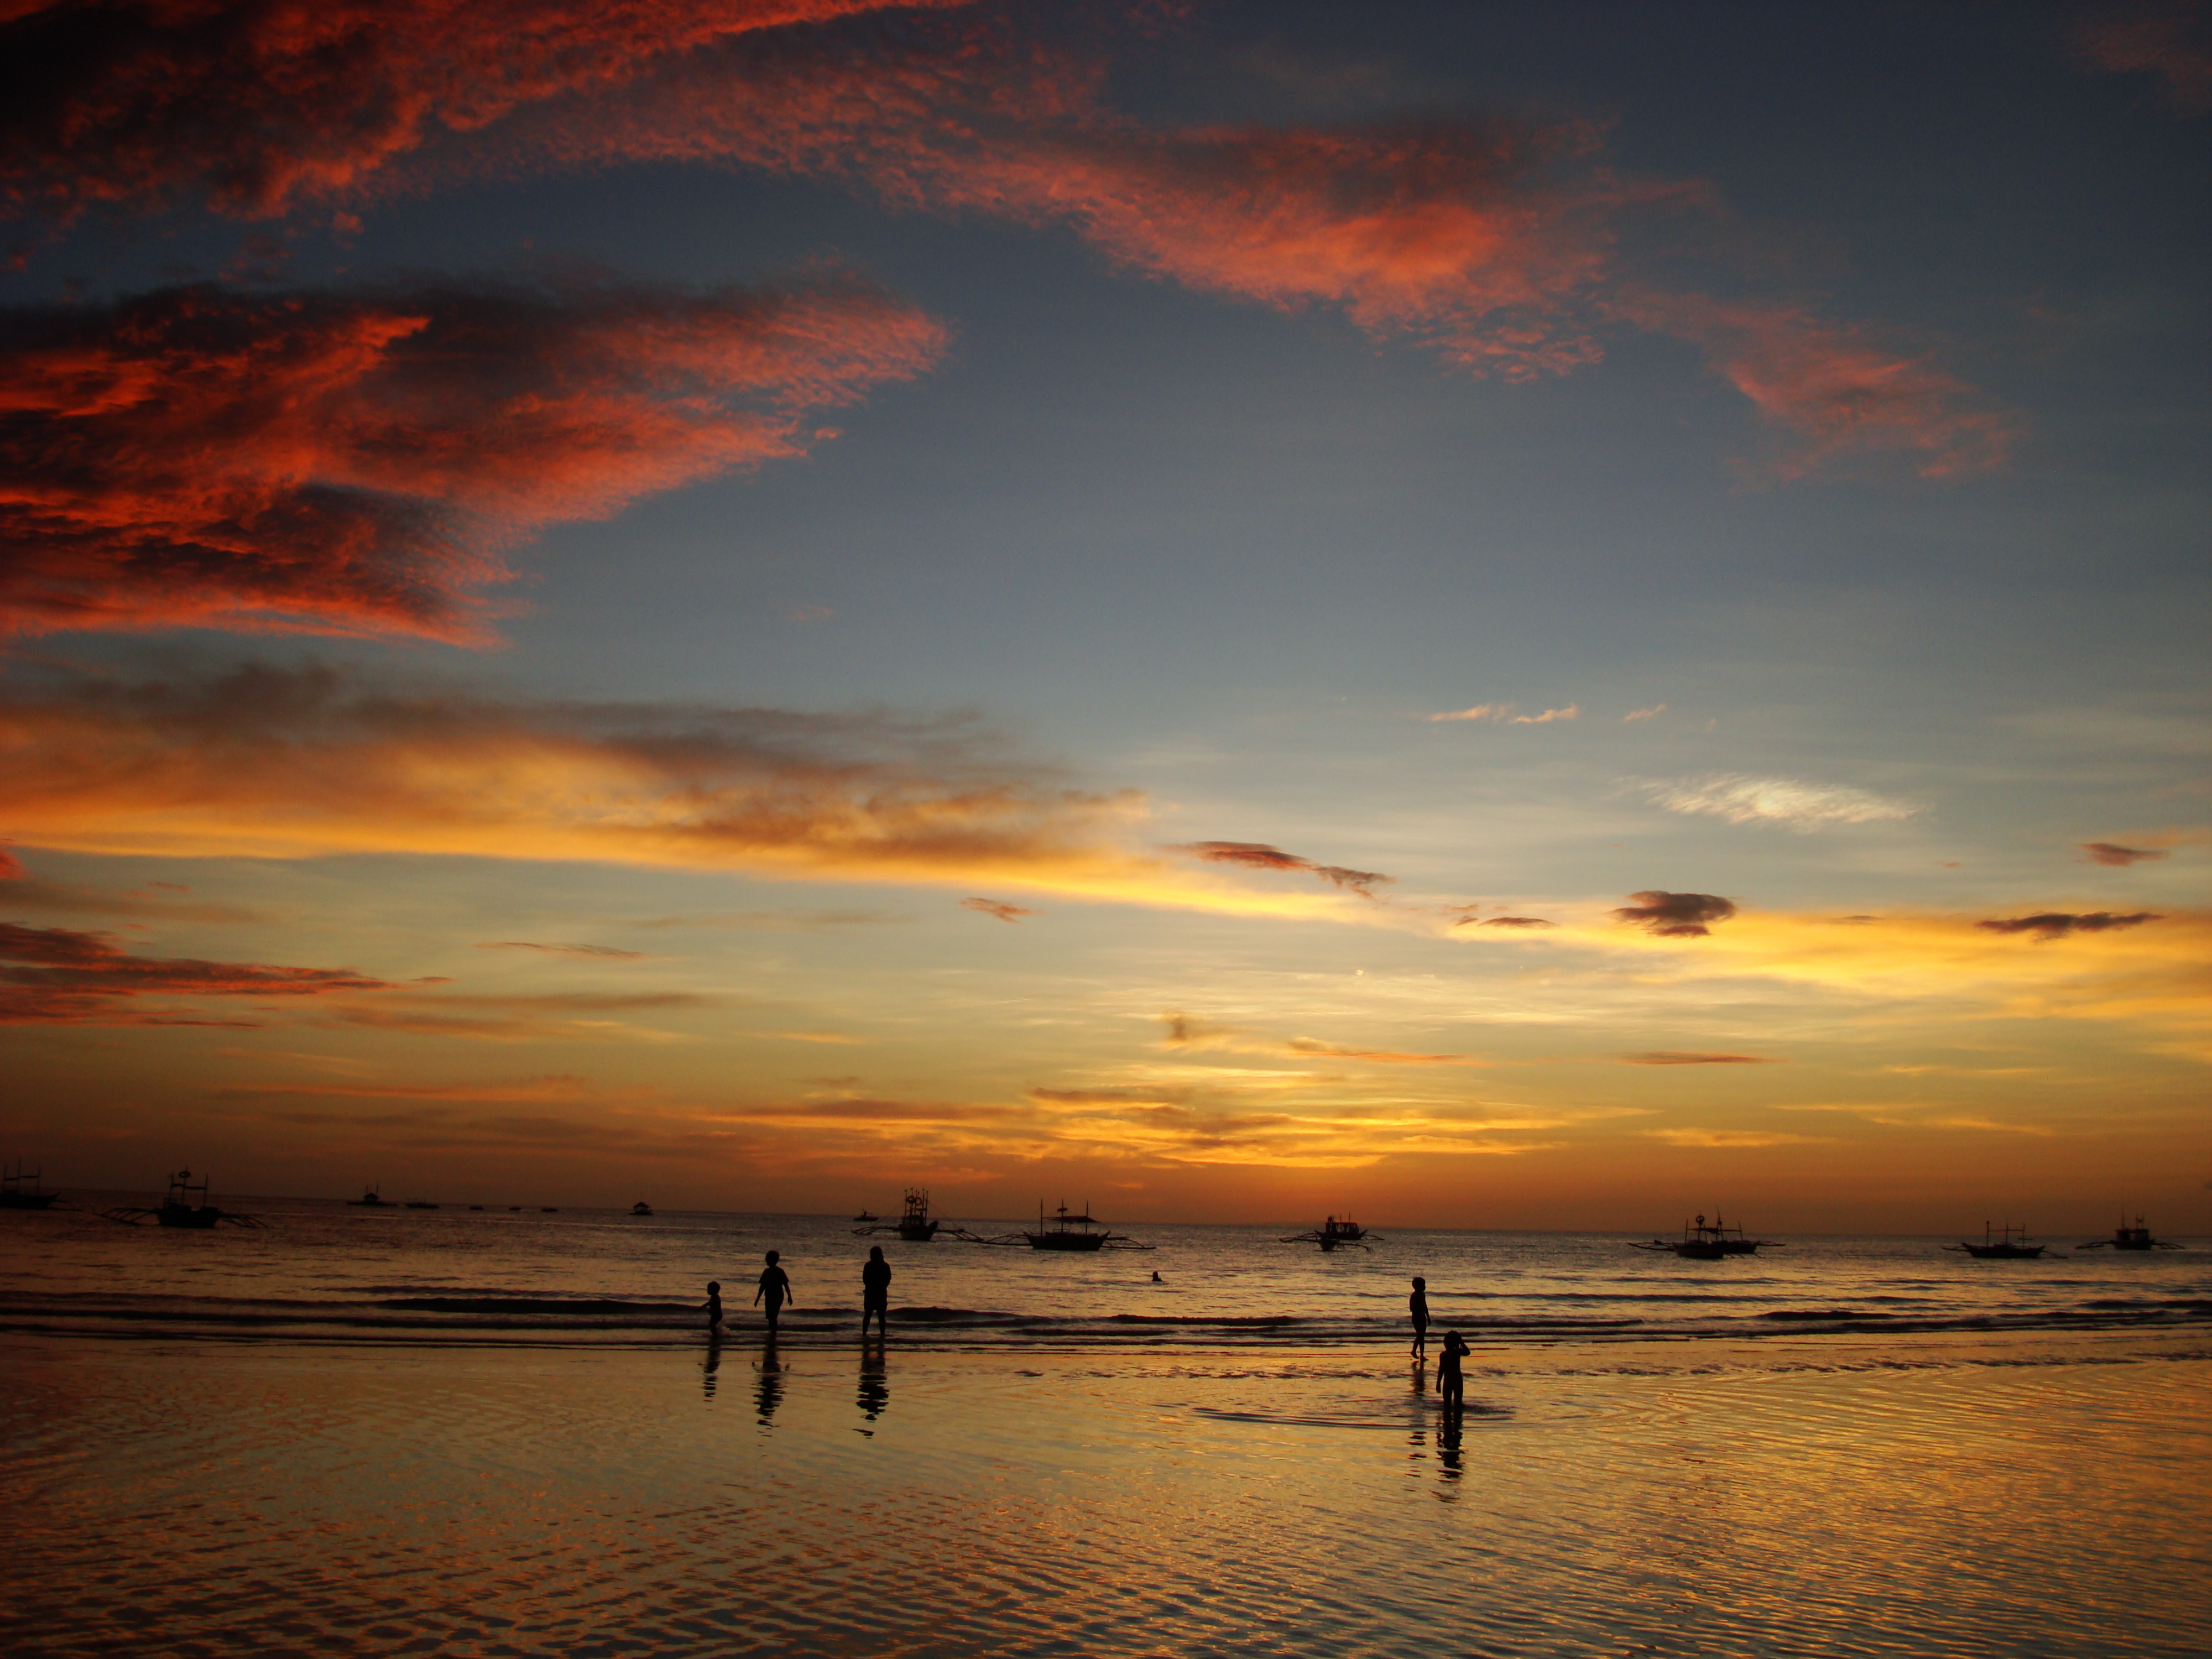 Sunset Philippines Boracay Beach 17